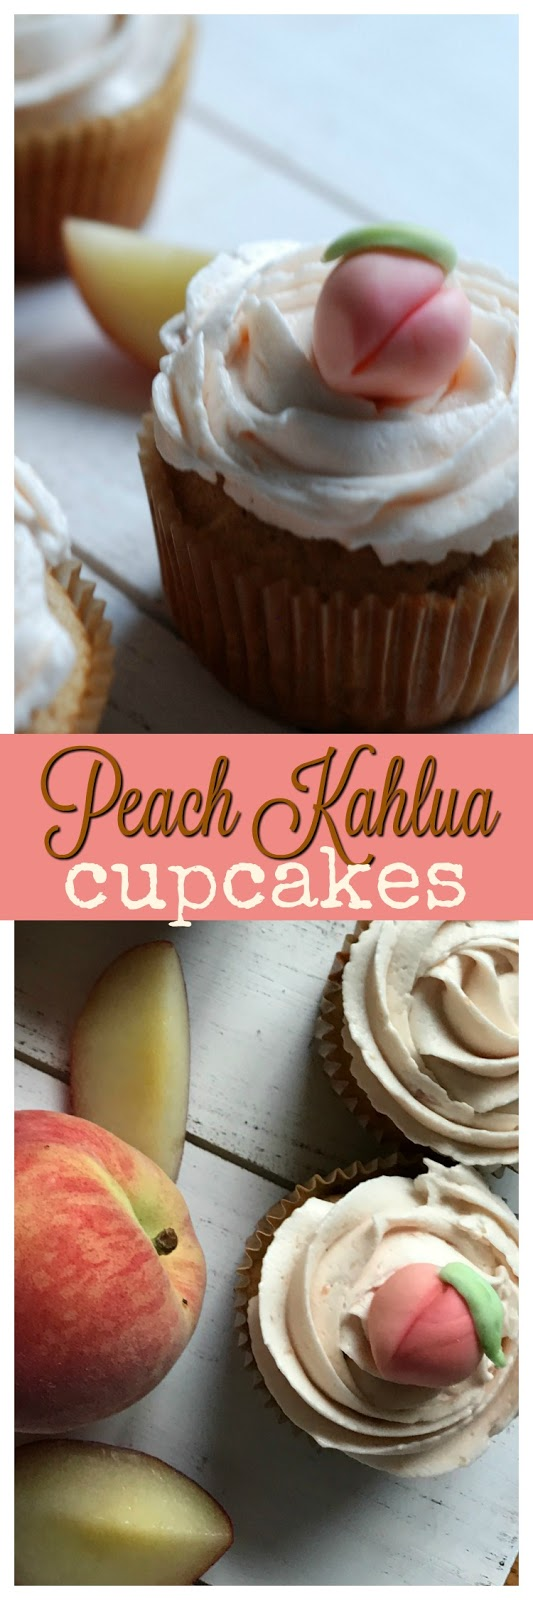 easy peach kahula cupcakes and buttercream recipe